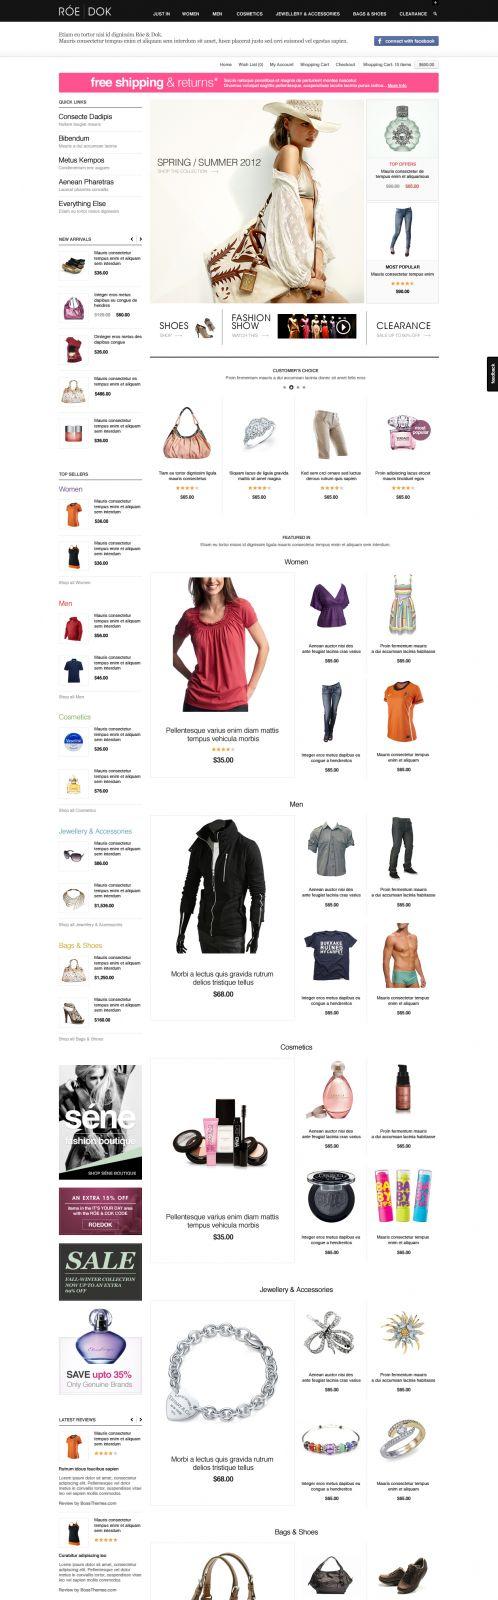 Fashion OpenCart Theme - BossThemes RoeDok - Home